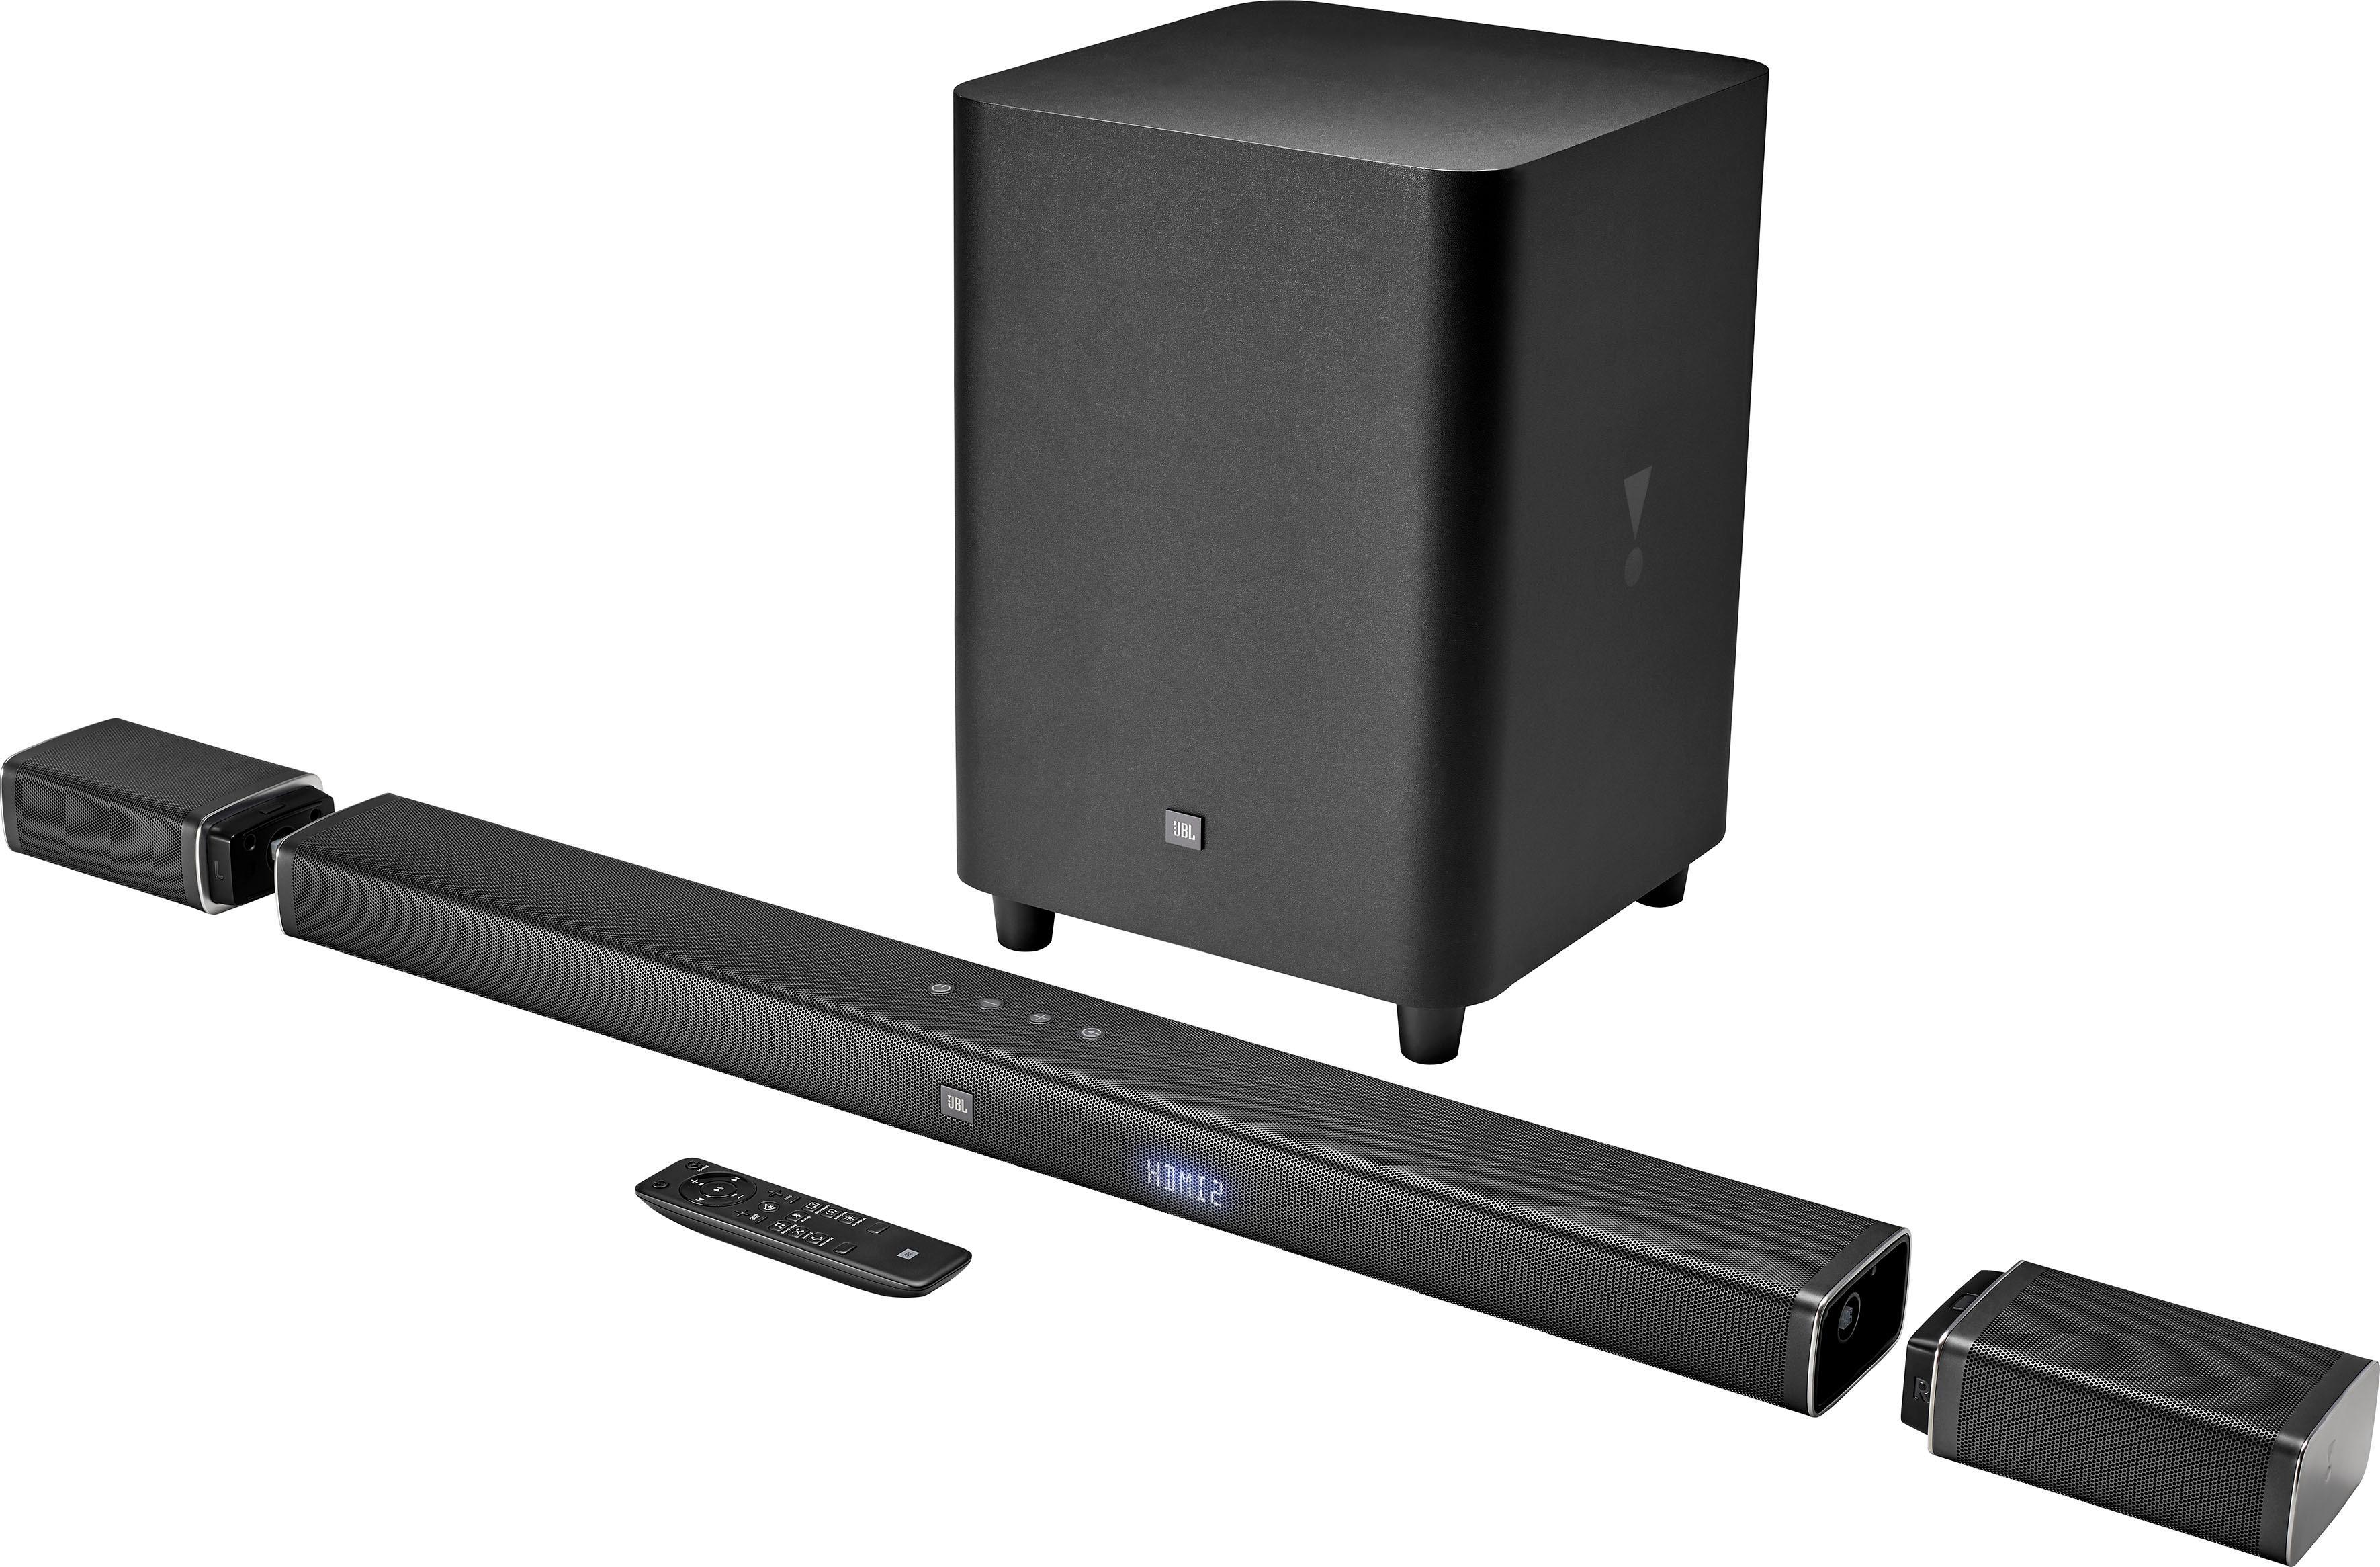 jbl bar 5 1 soundbar 510 watt auf rechnung kaufen. Black Bedroom Furniture Sets. Home Design Ideas